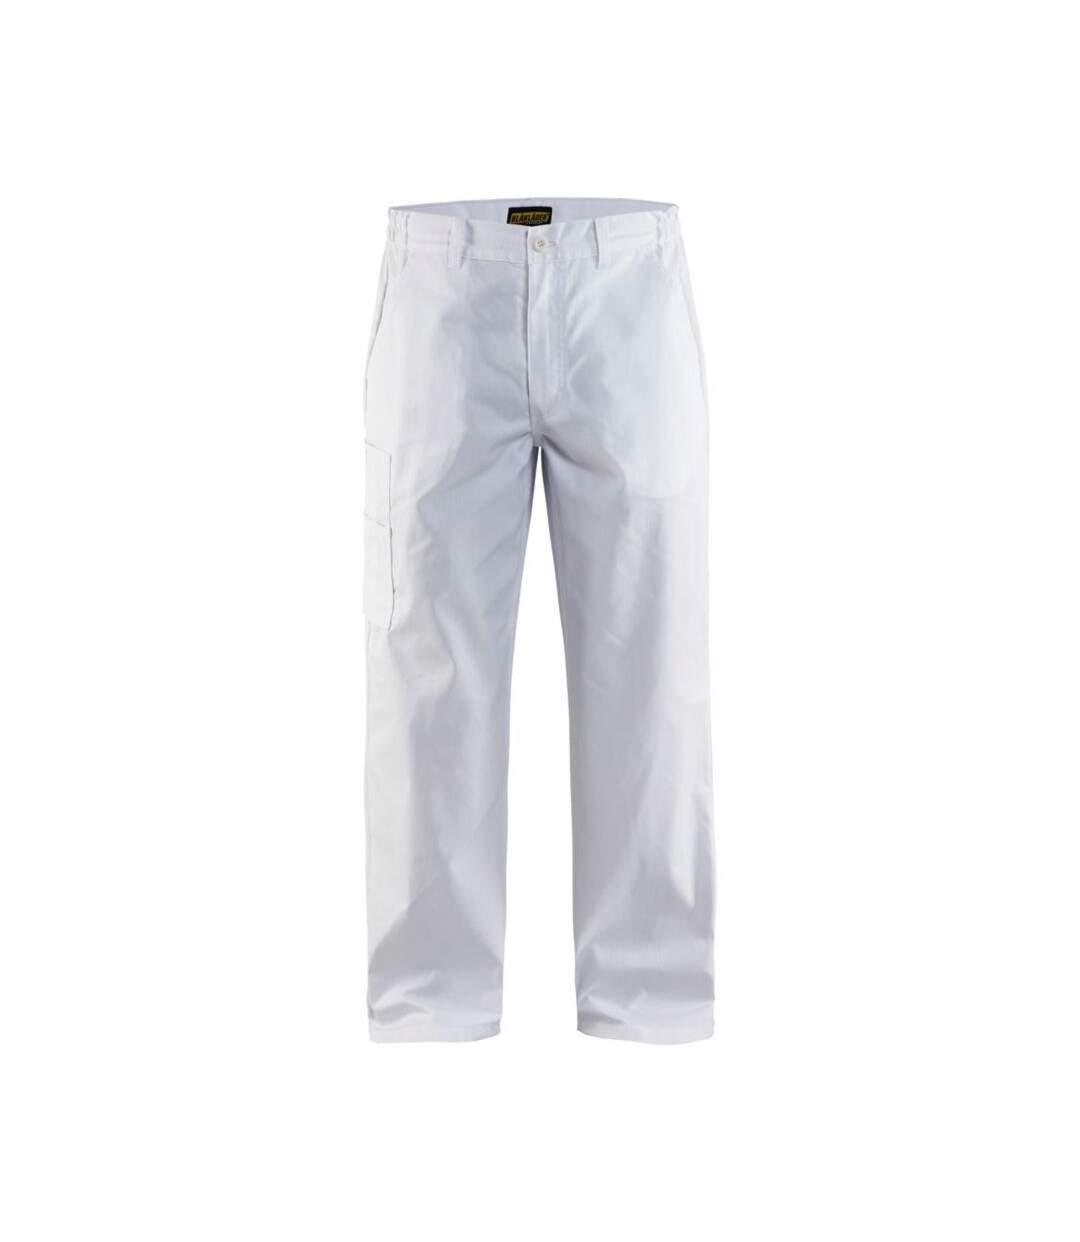 Pantalon  Blaklader  polycoton